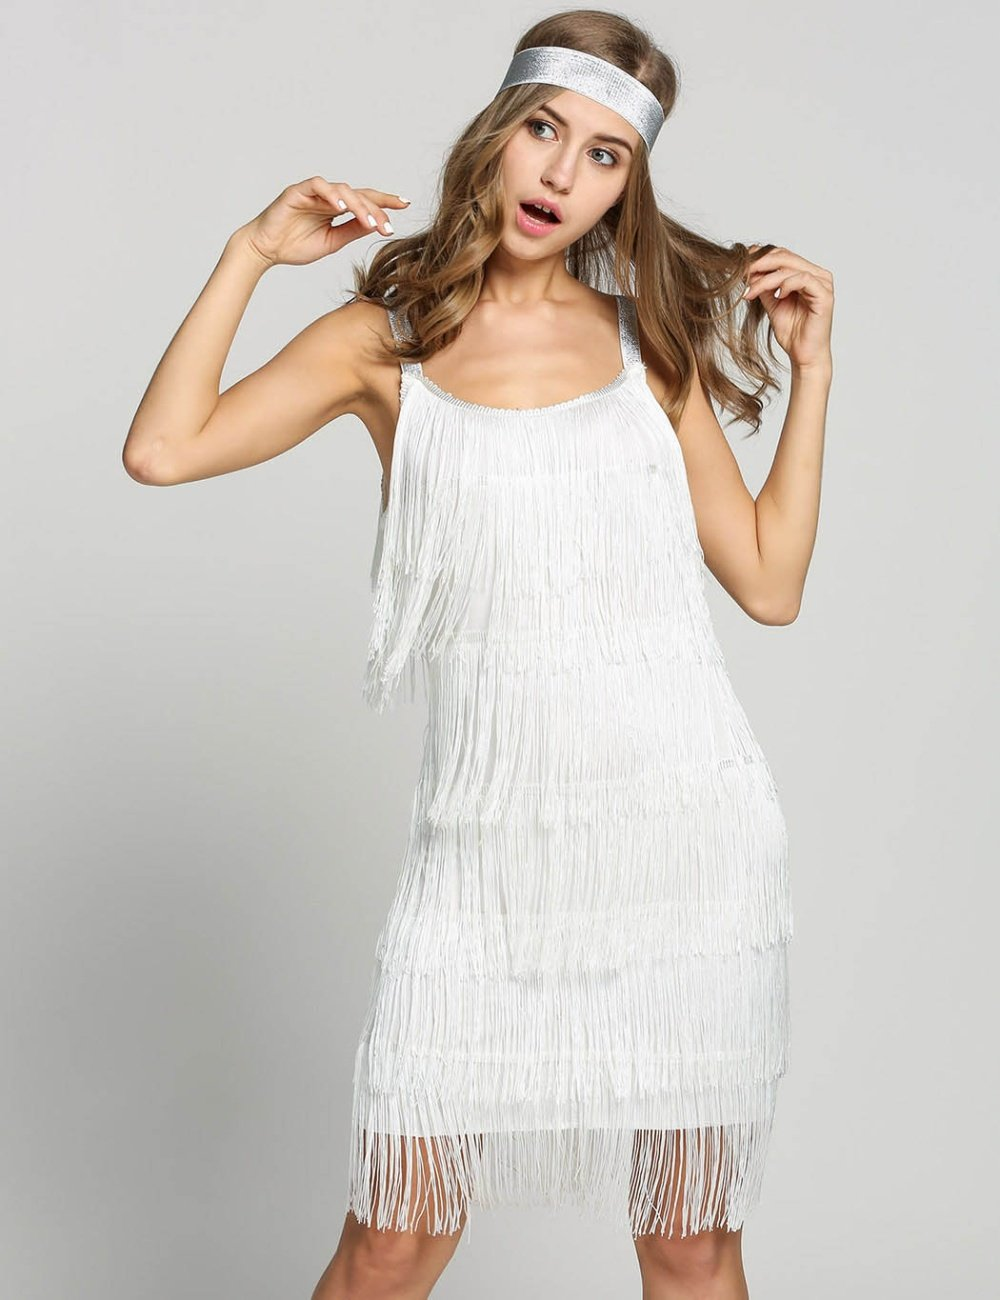 flapper fringe dress (2)